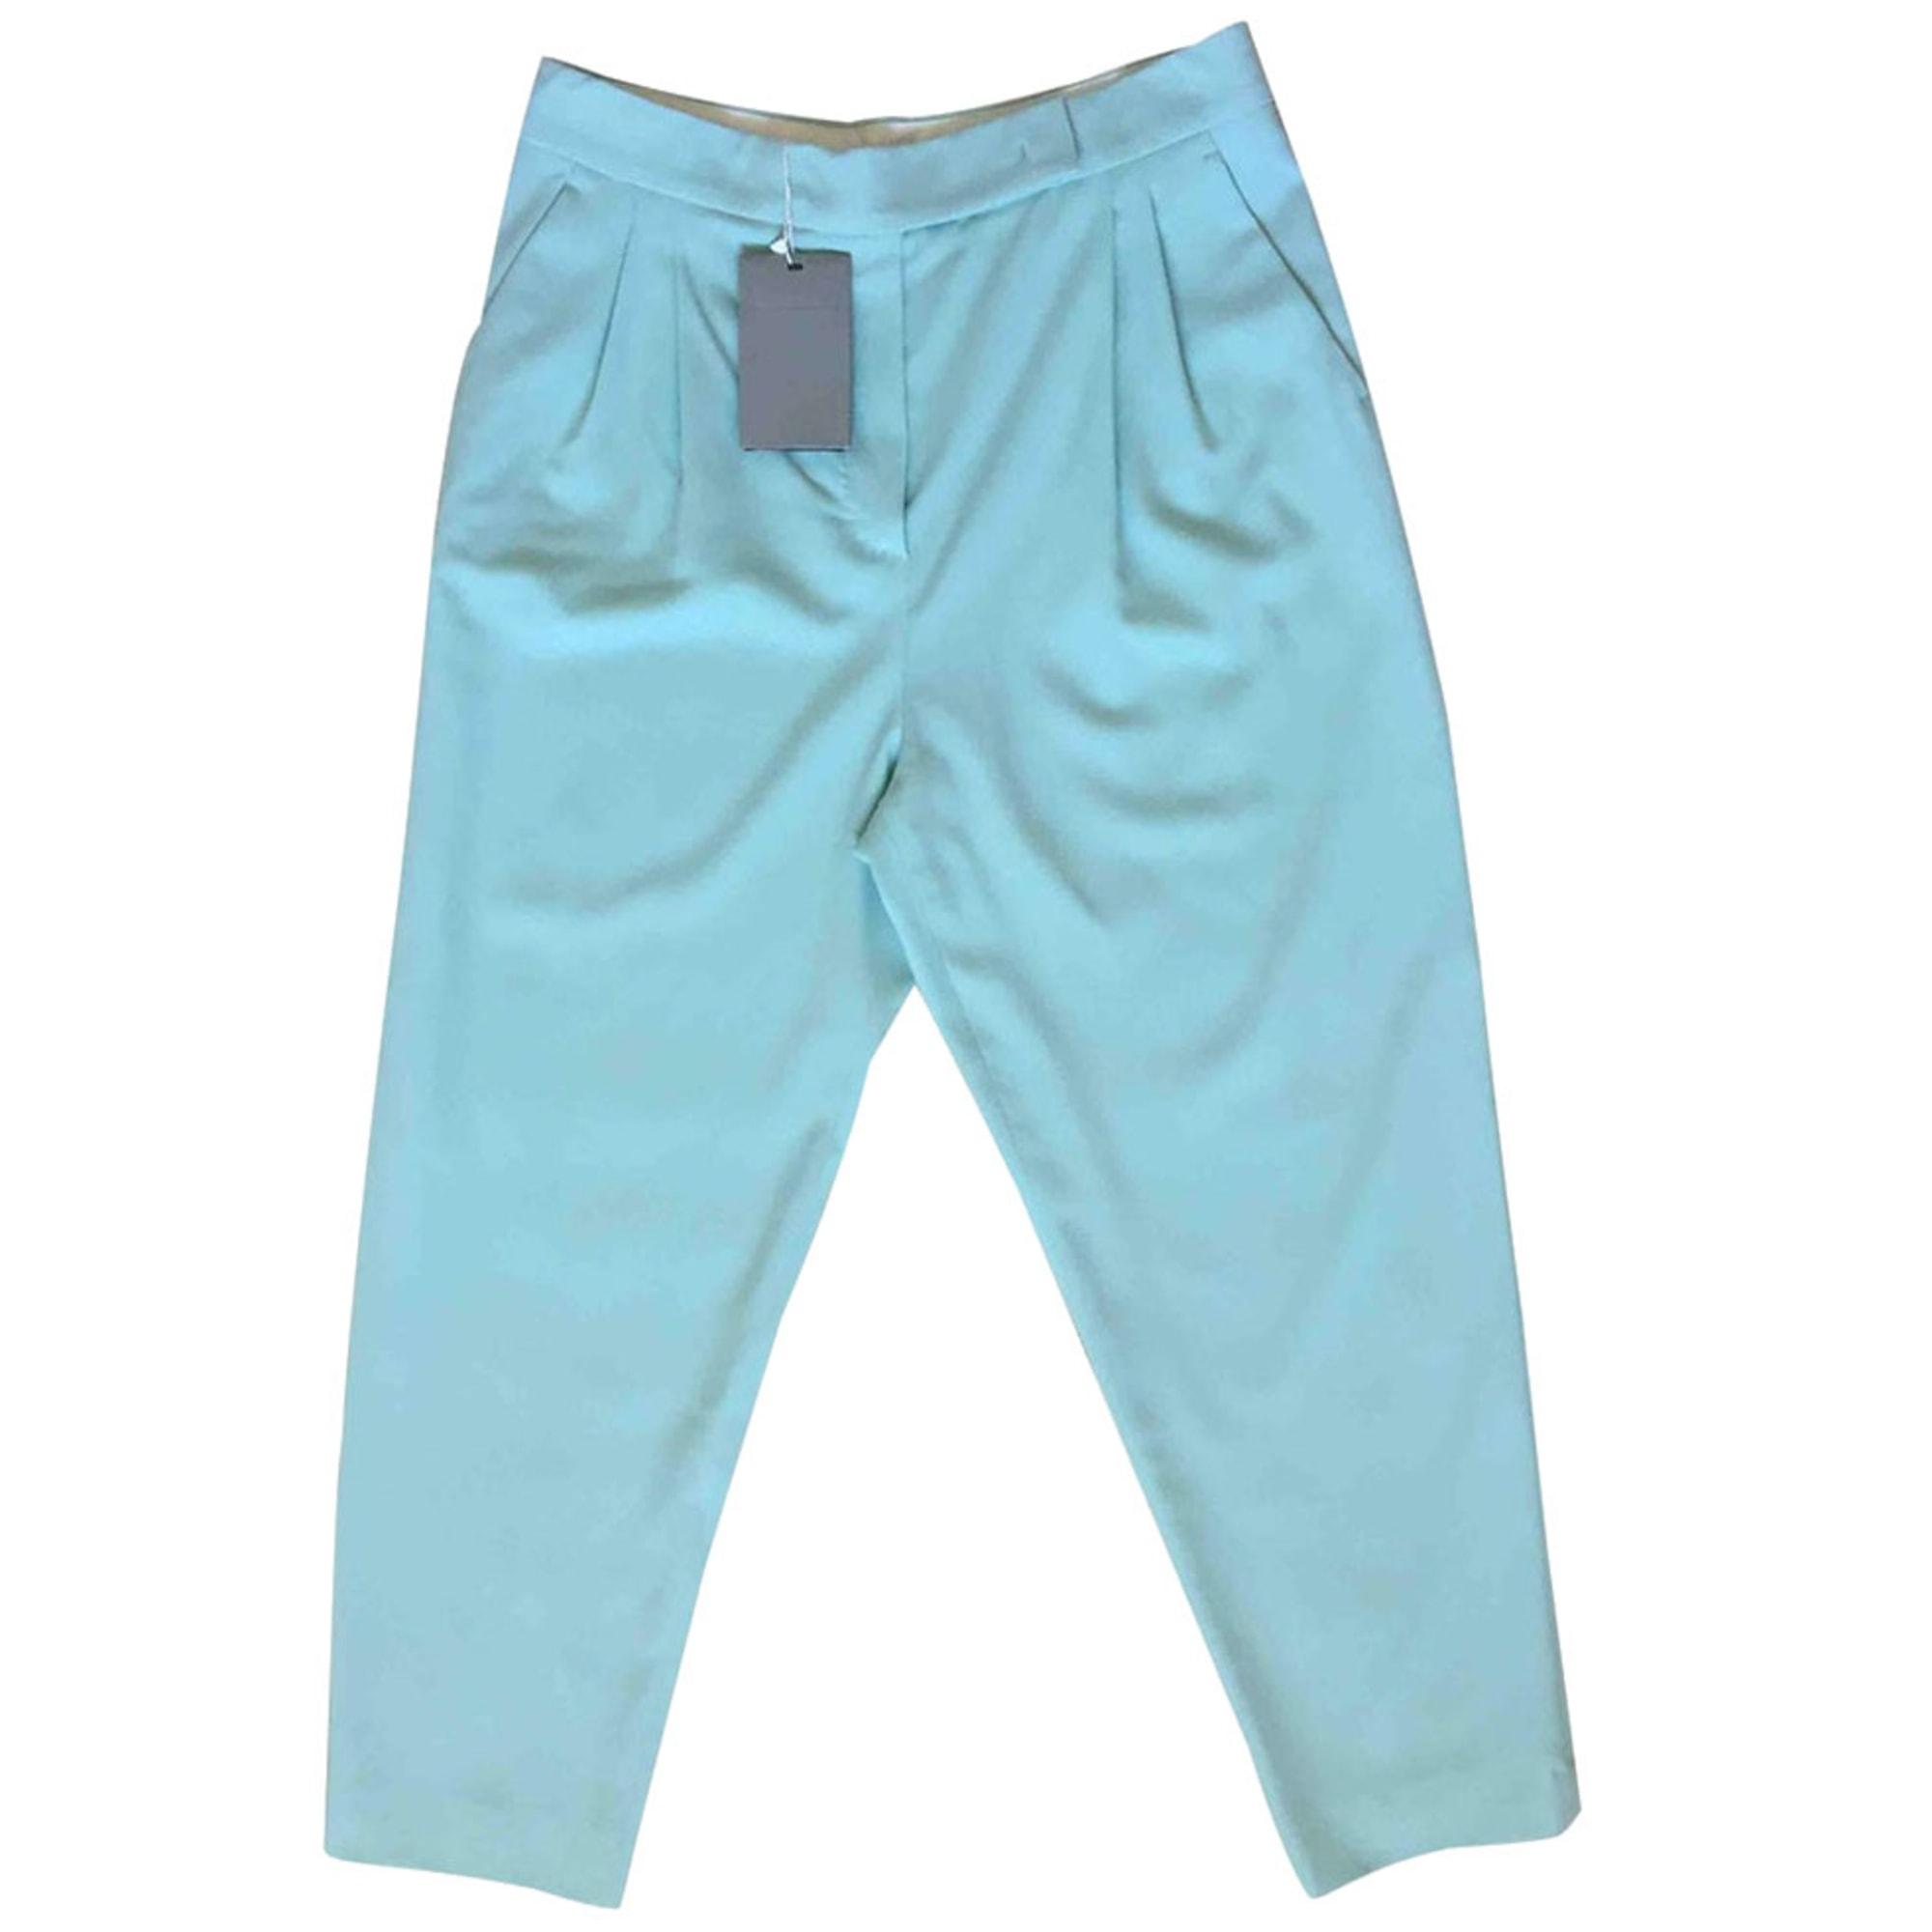 Pantalon droit MAX MARA Bleu, bleu marine, bleu turquoise